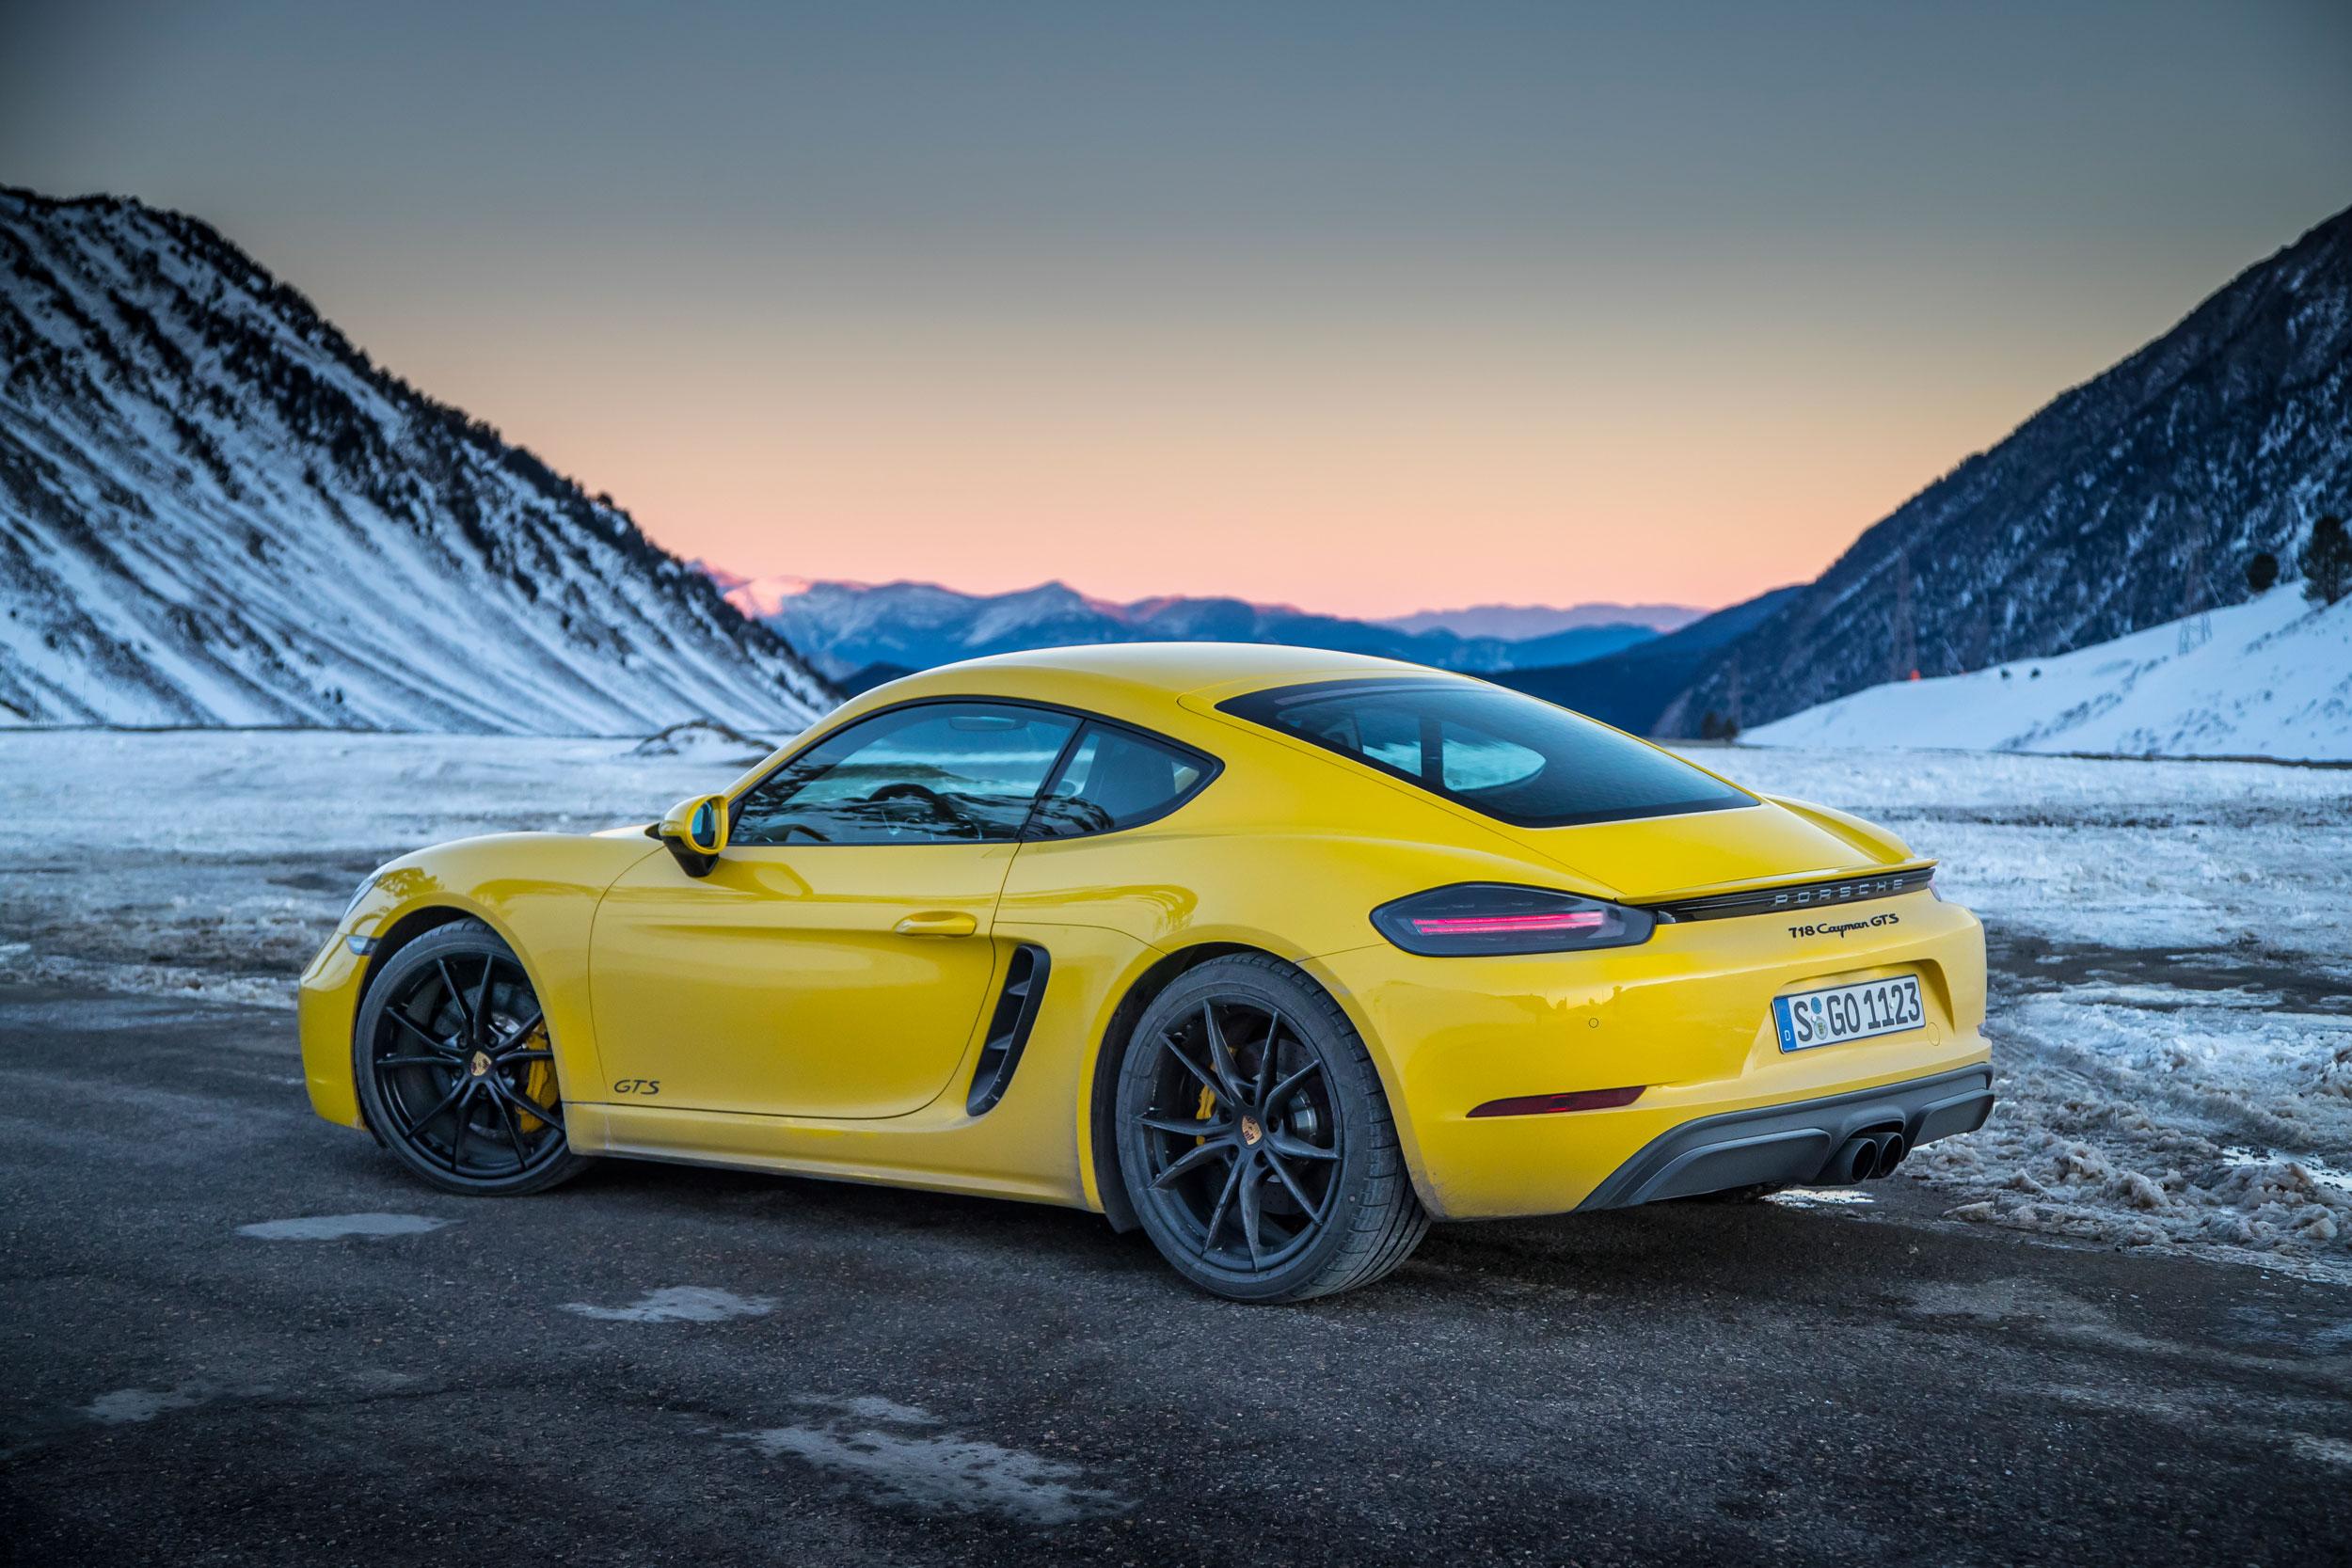 Porsche 718 Cayman review – The entry-level Porsche punches